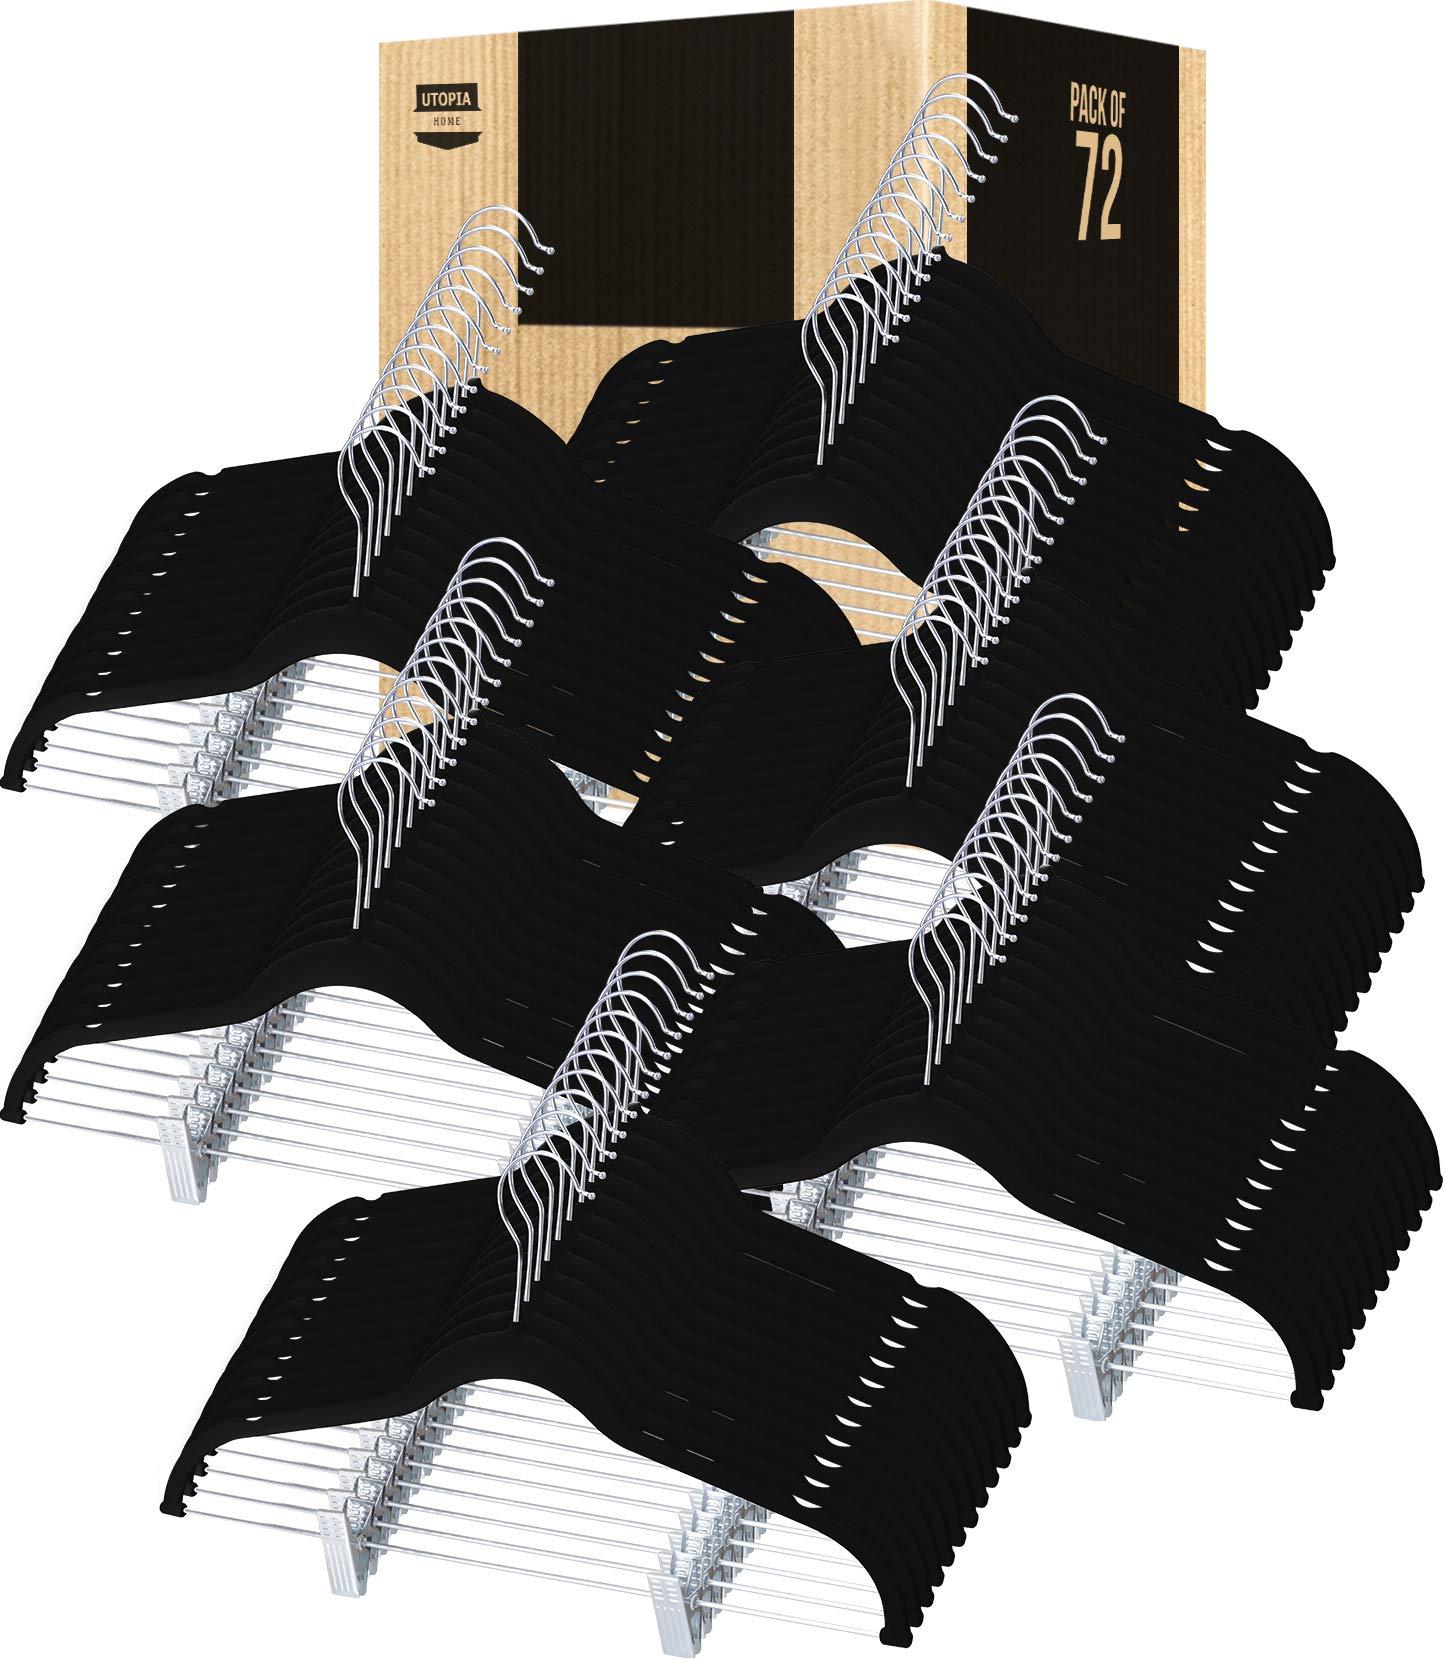 Utopia Home Velvet Skirt Hangers - Non Slip Velvet Clothes Hangers with Notches for Pants and Coats - (Black, Pack of 72)